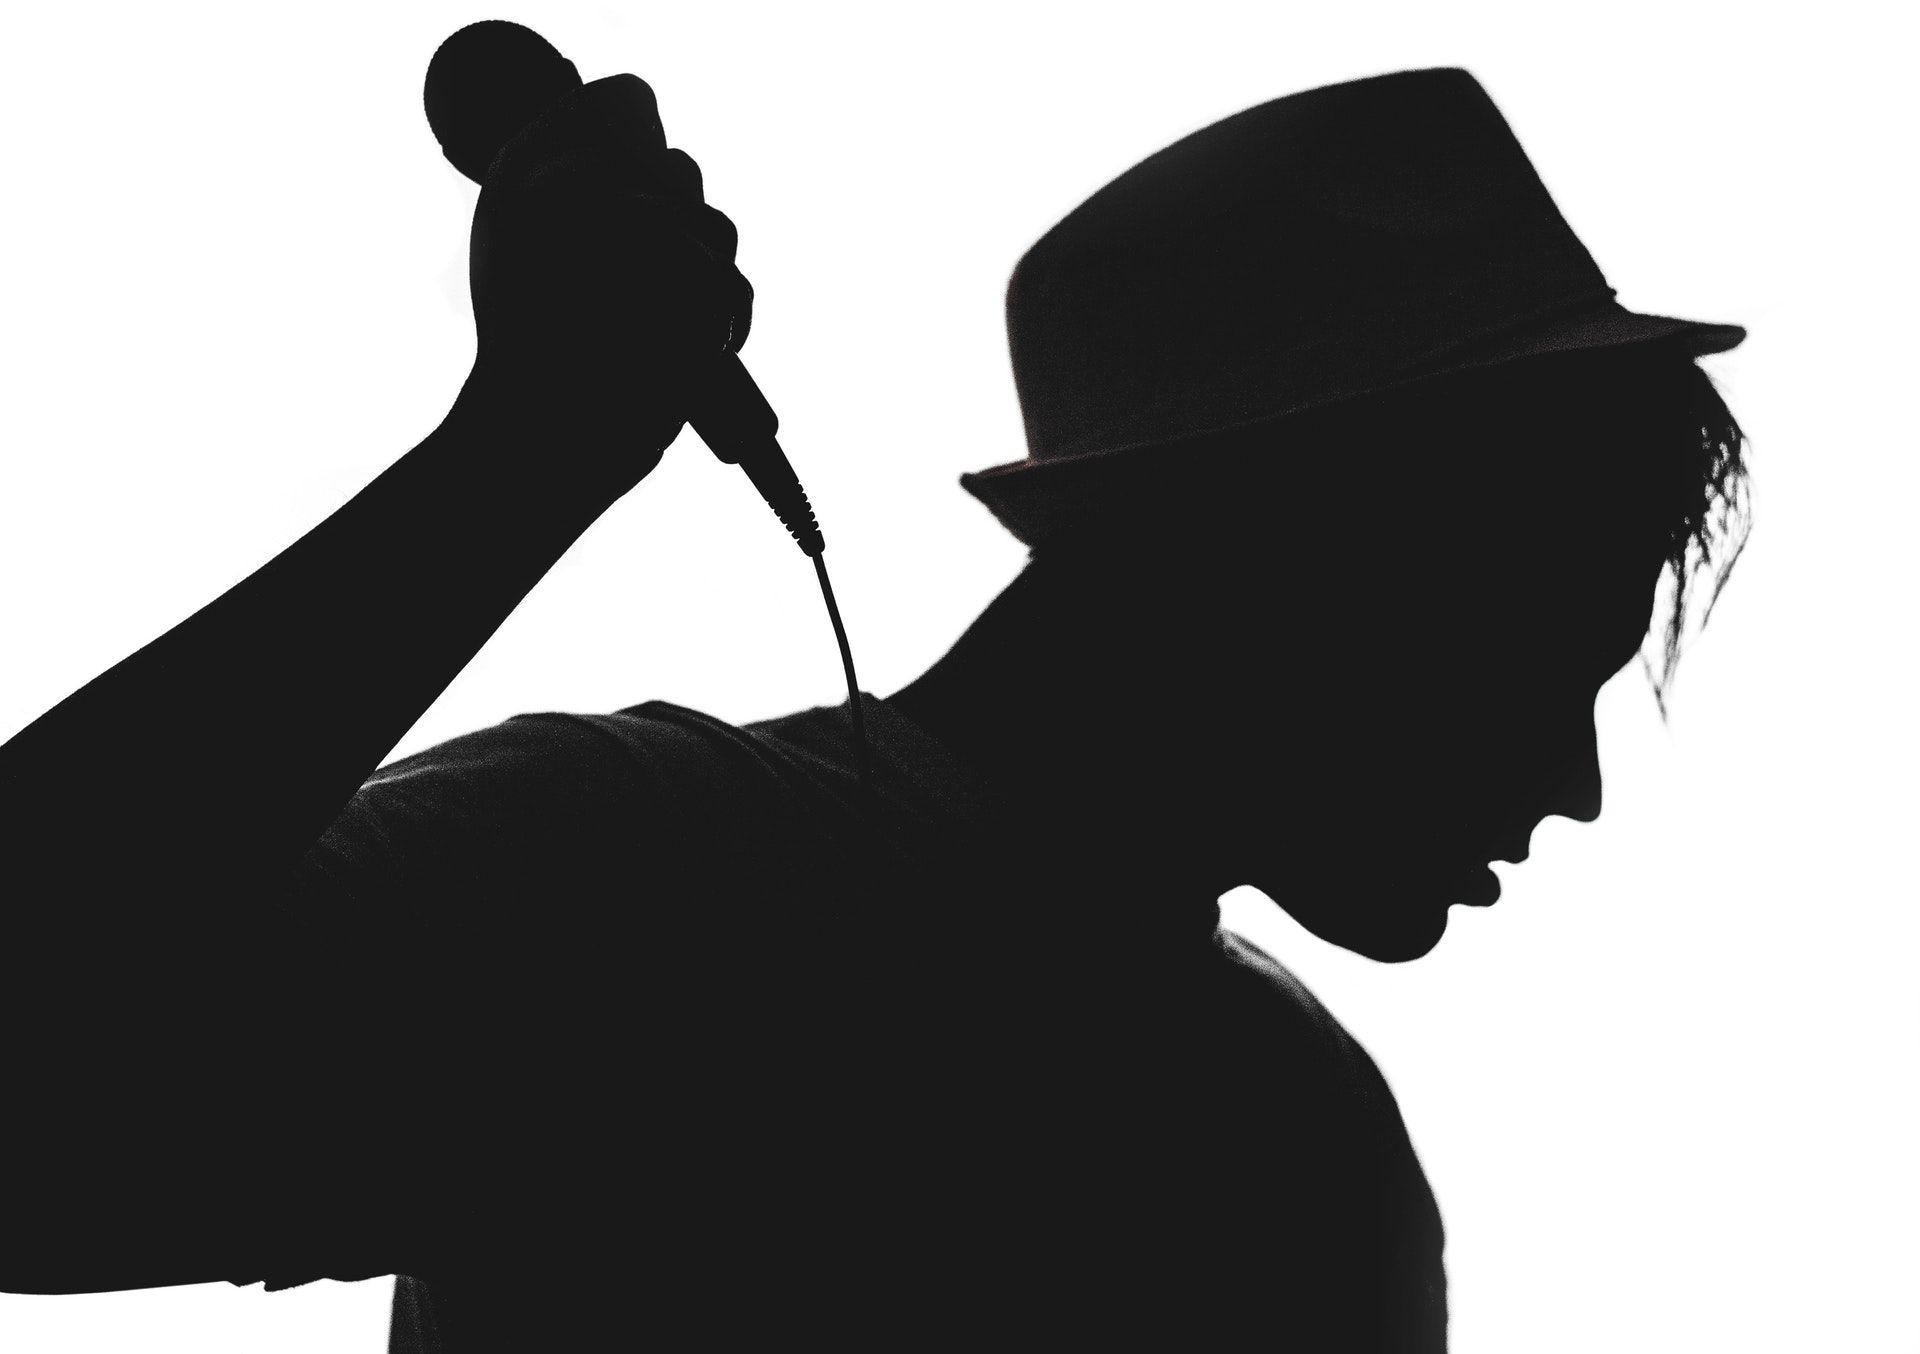 عکس زمینه شبح یک خواننده مرد پس زمینه